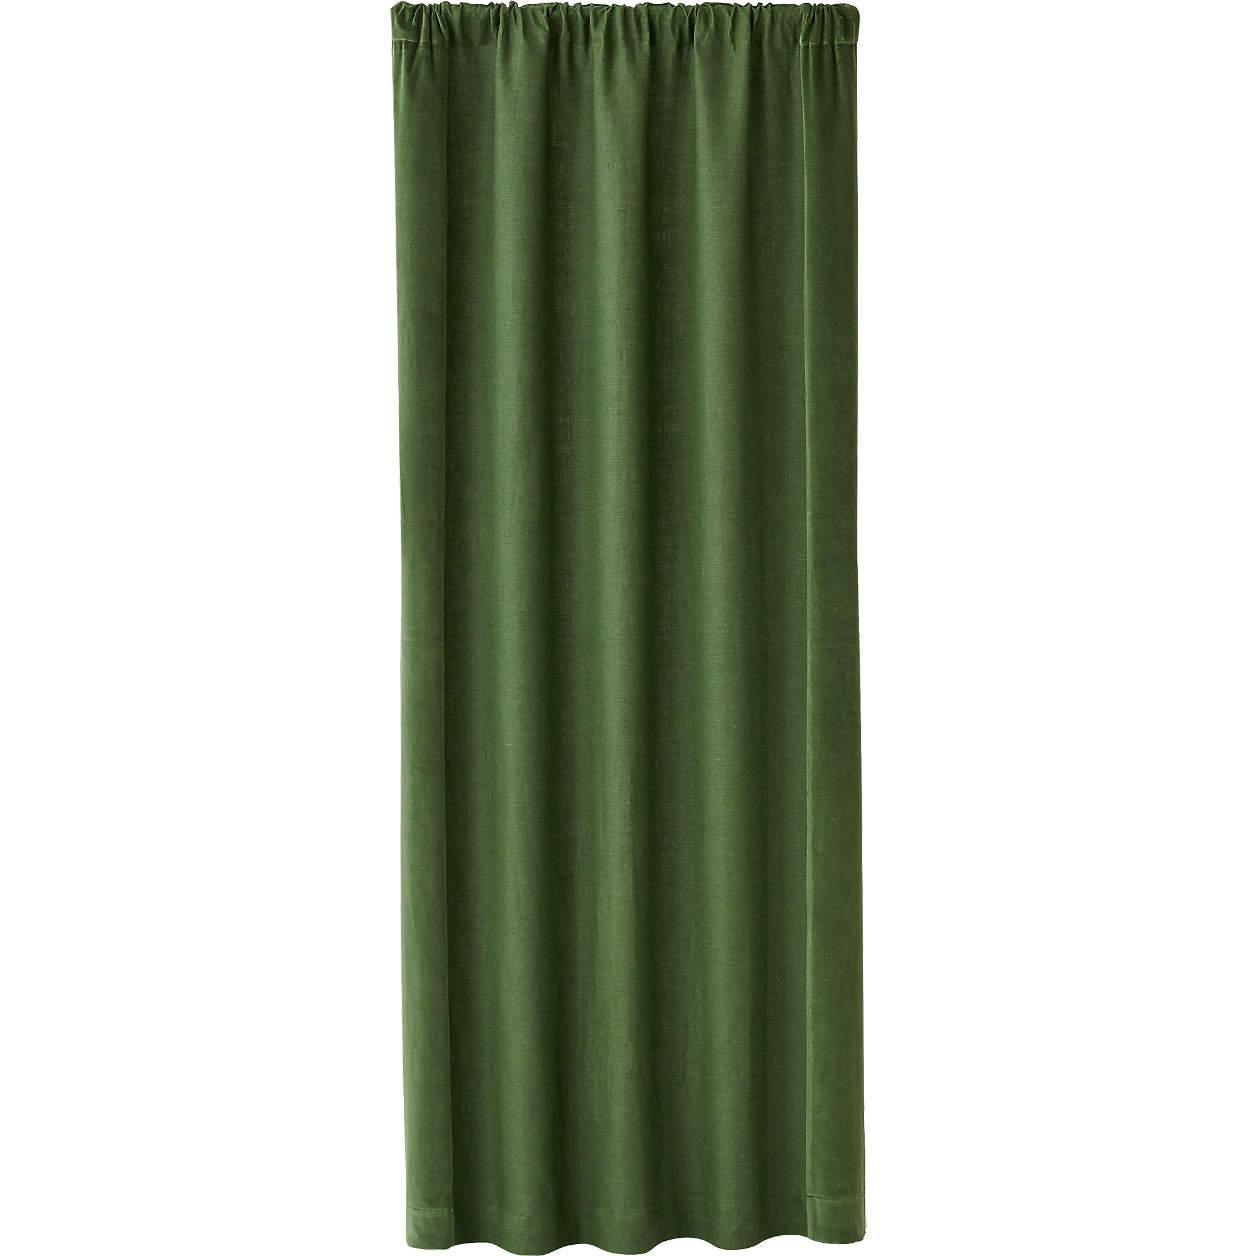 Ezria Linen Curtain Panel